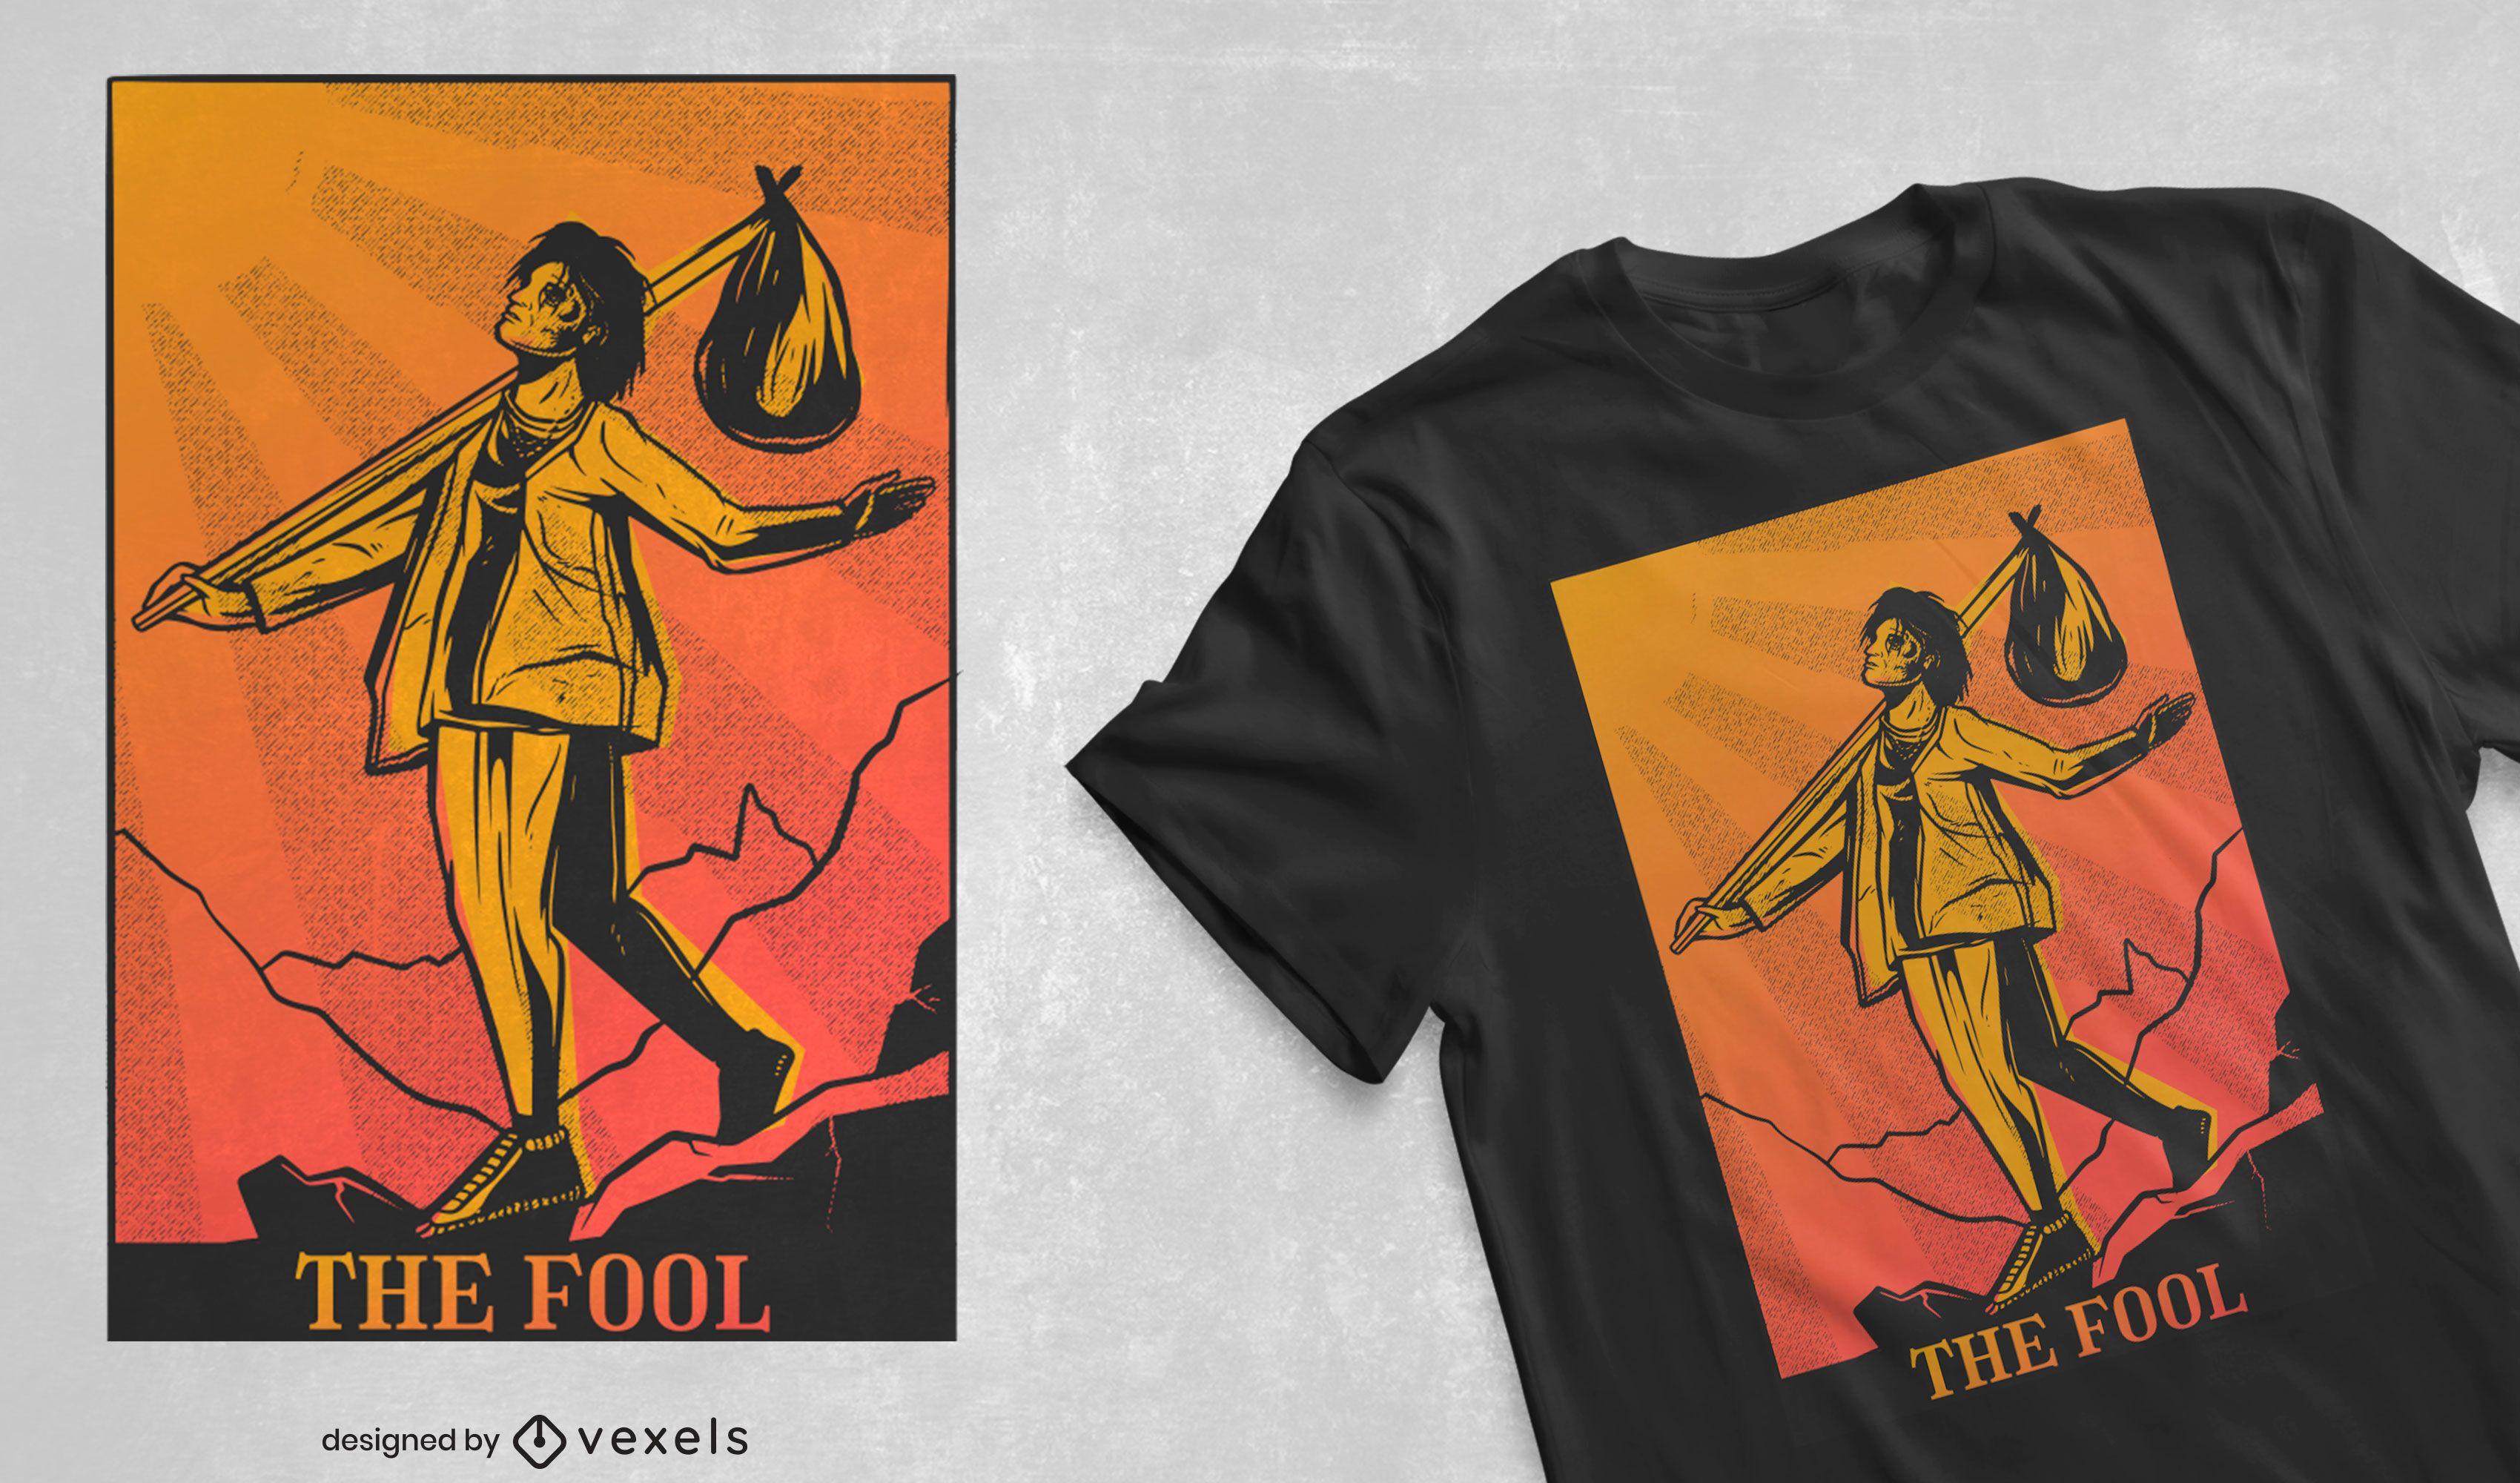 El diseño de la camiseta de la carta del tarot tonto